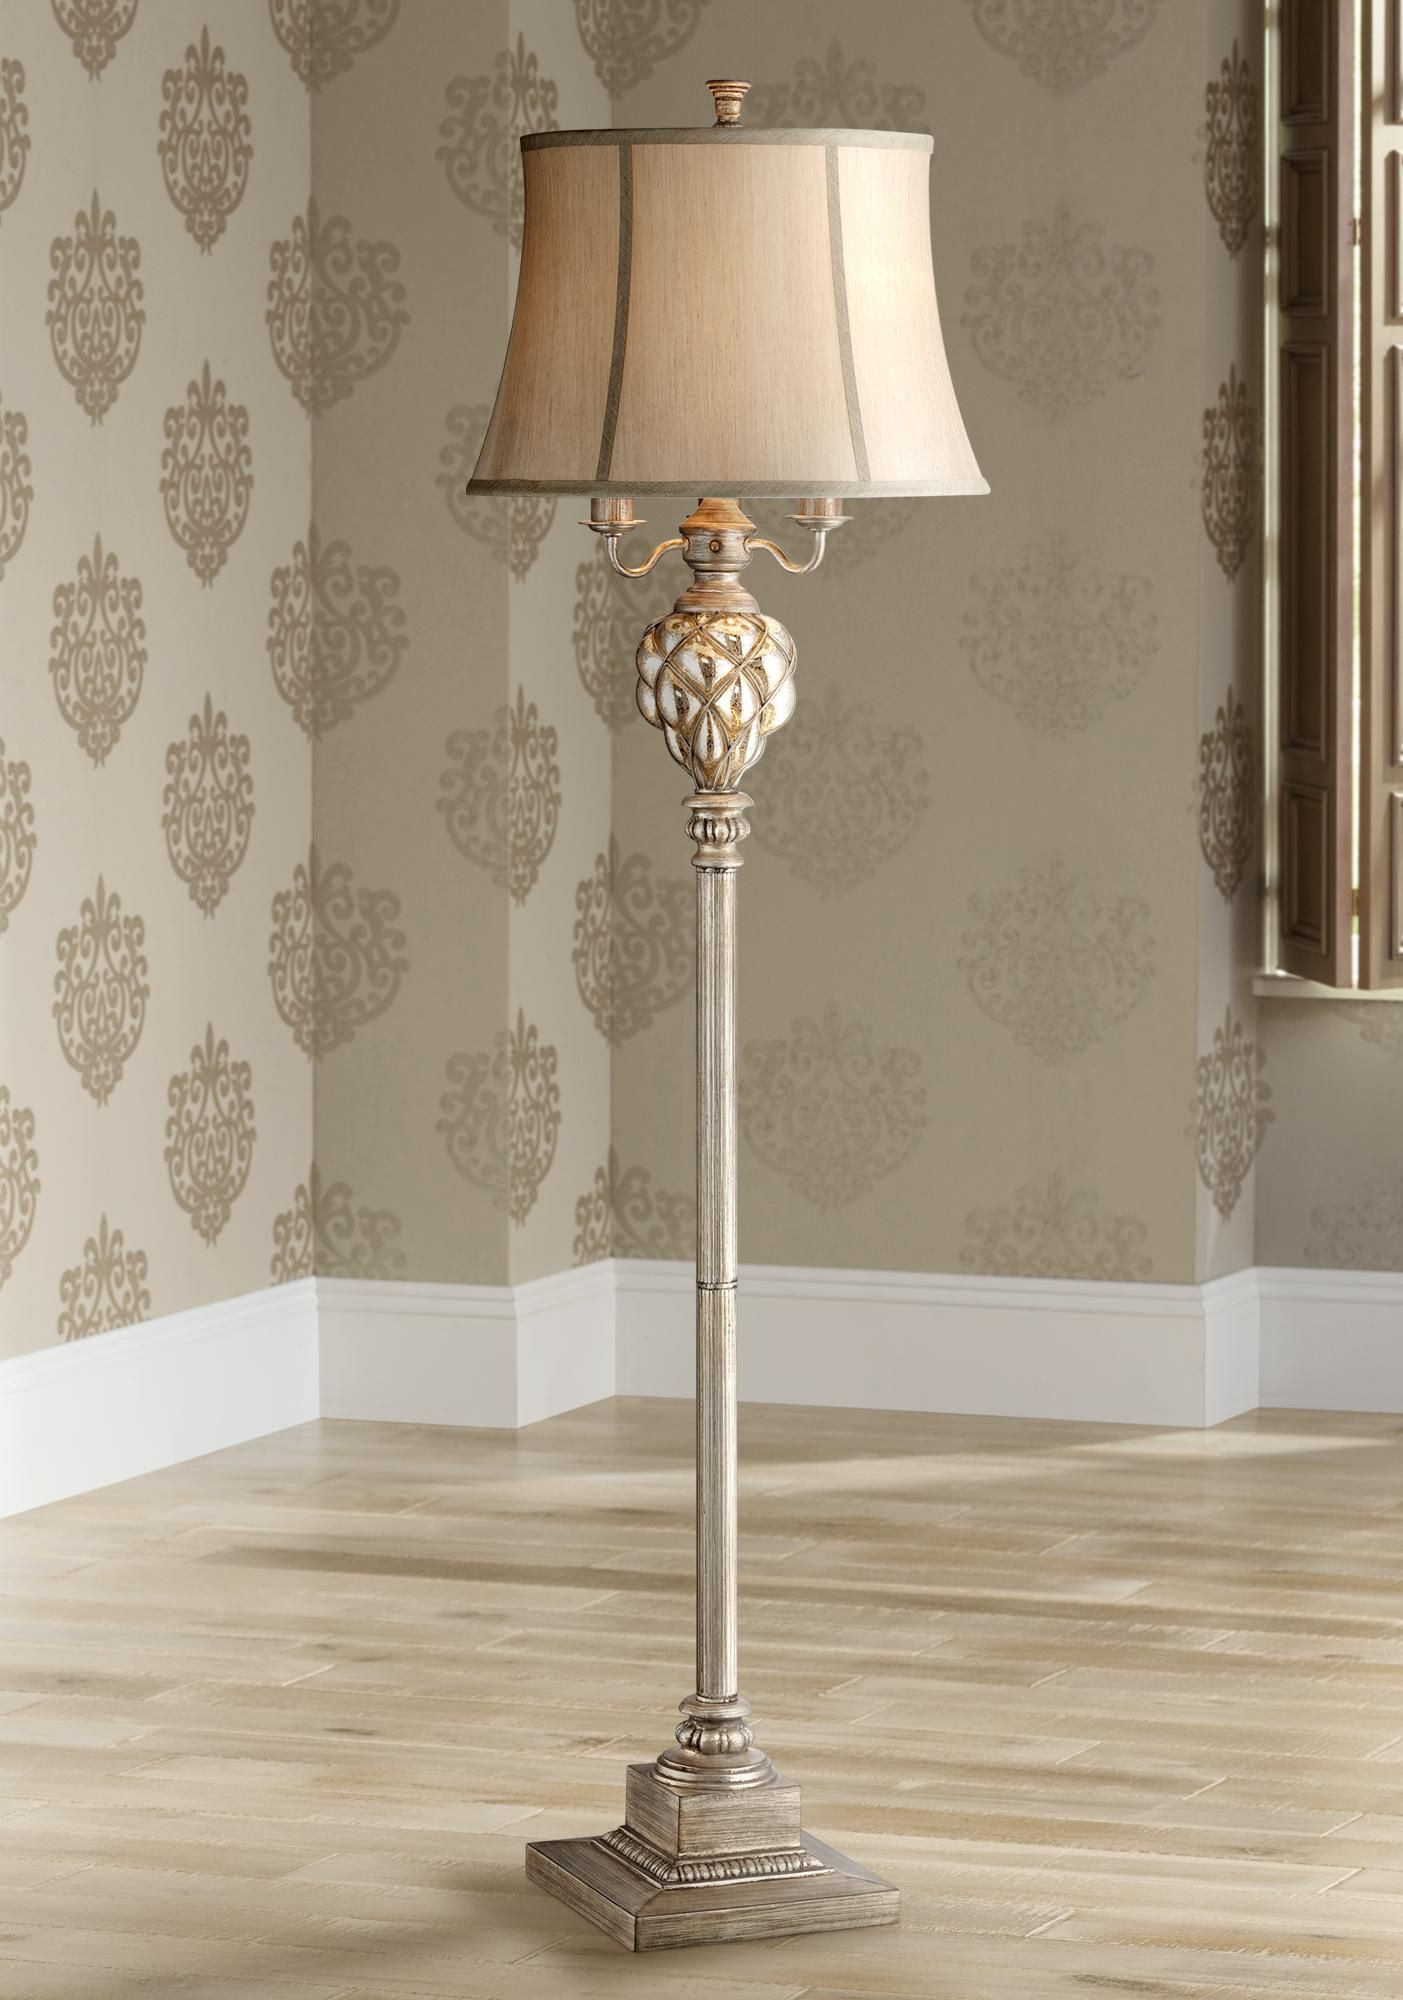 Olde 4 Light Floor Lamp With Led Night Light 3c563 Lamps Plus In 2020 Traditional Floor Lamps Floor Lamp Floor Lights